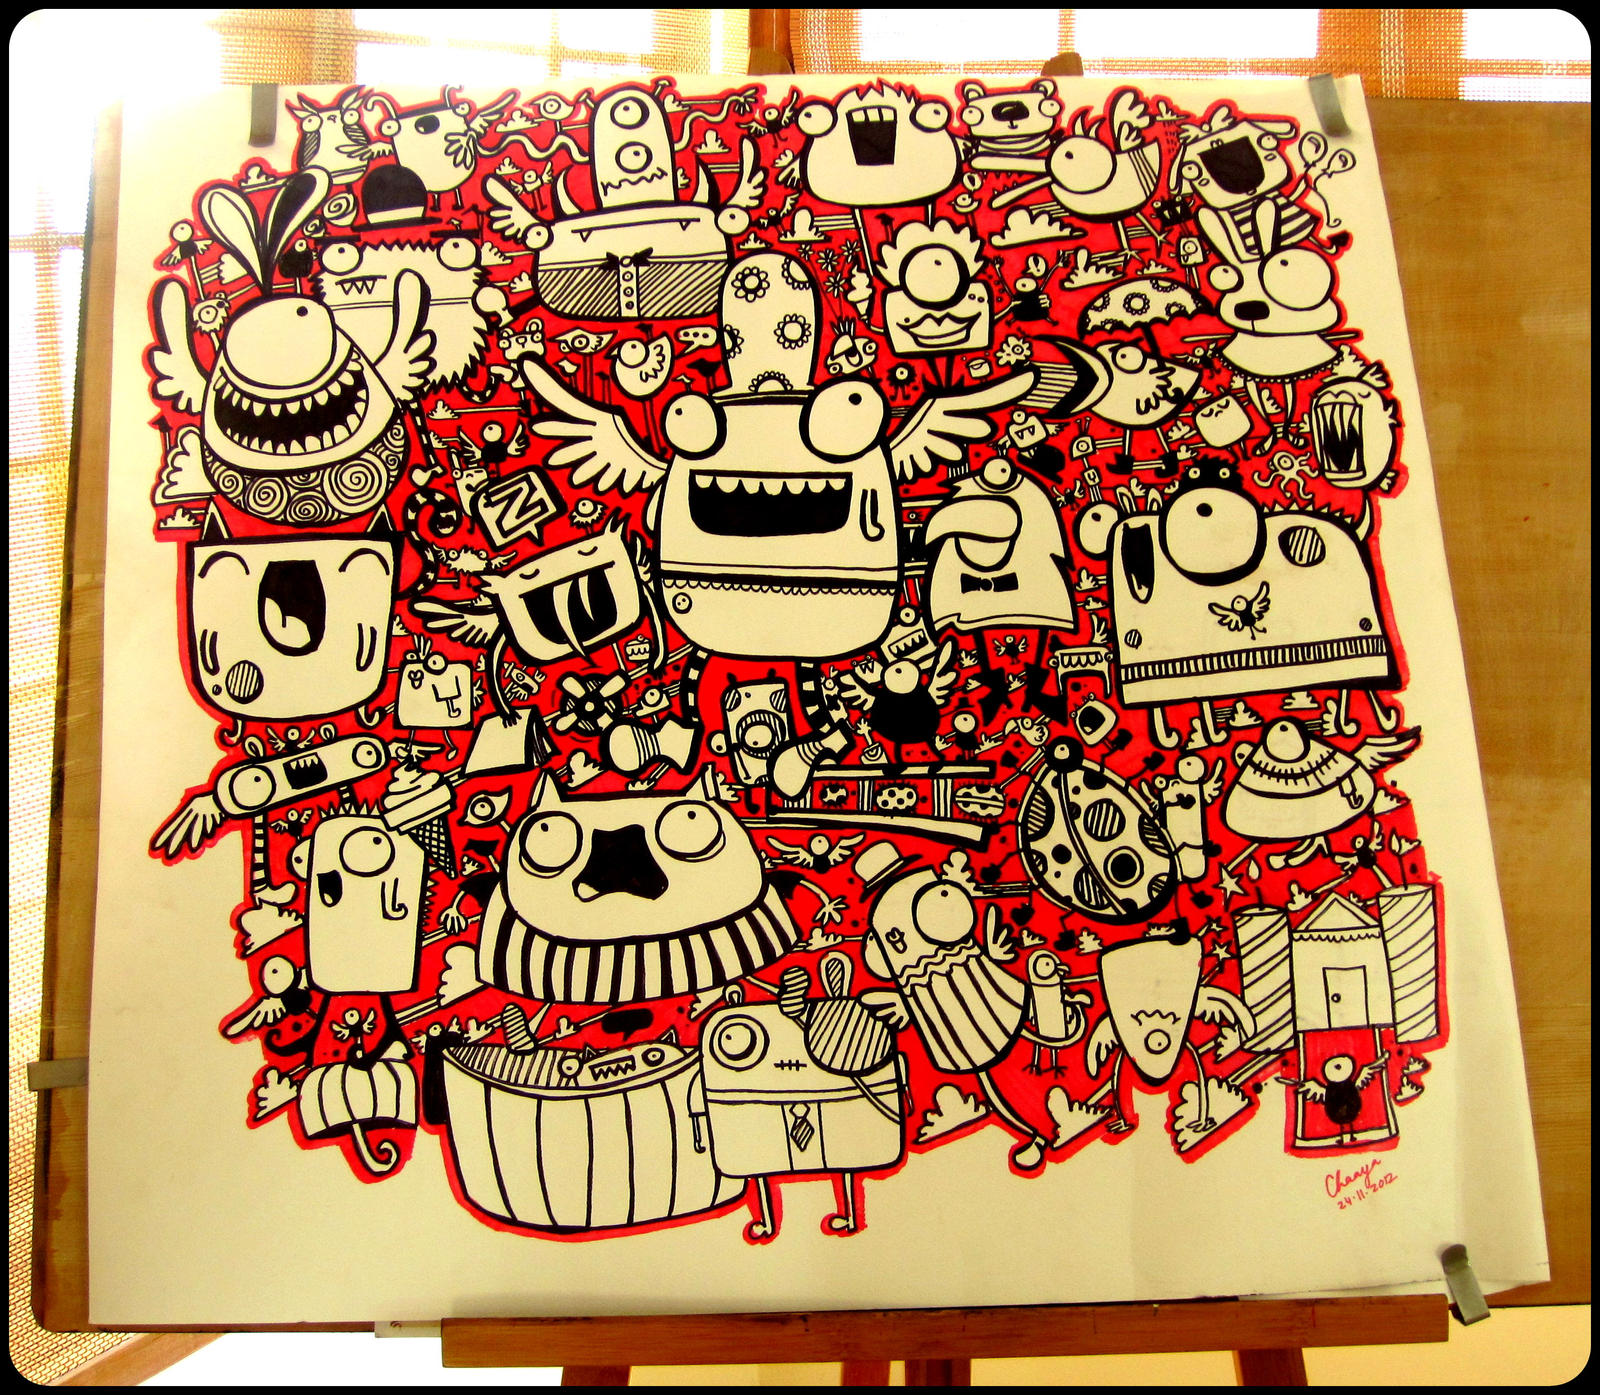 Big Doodle by dingbat23